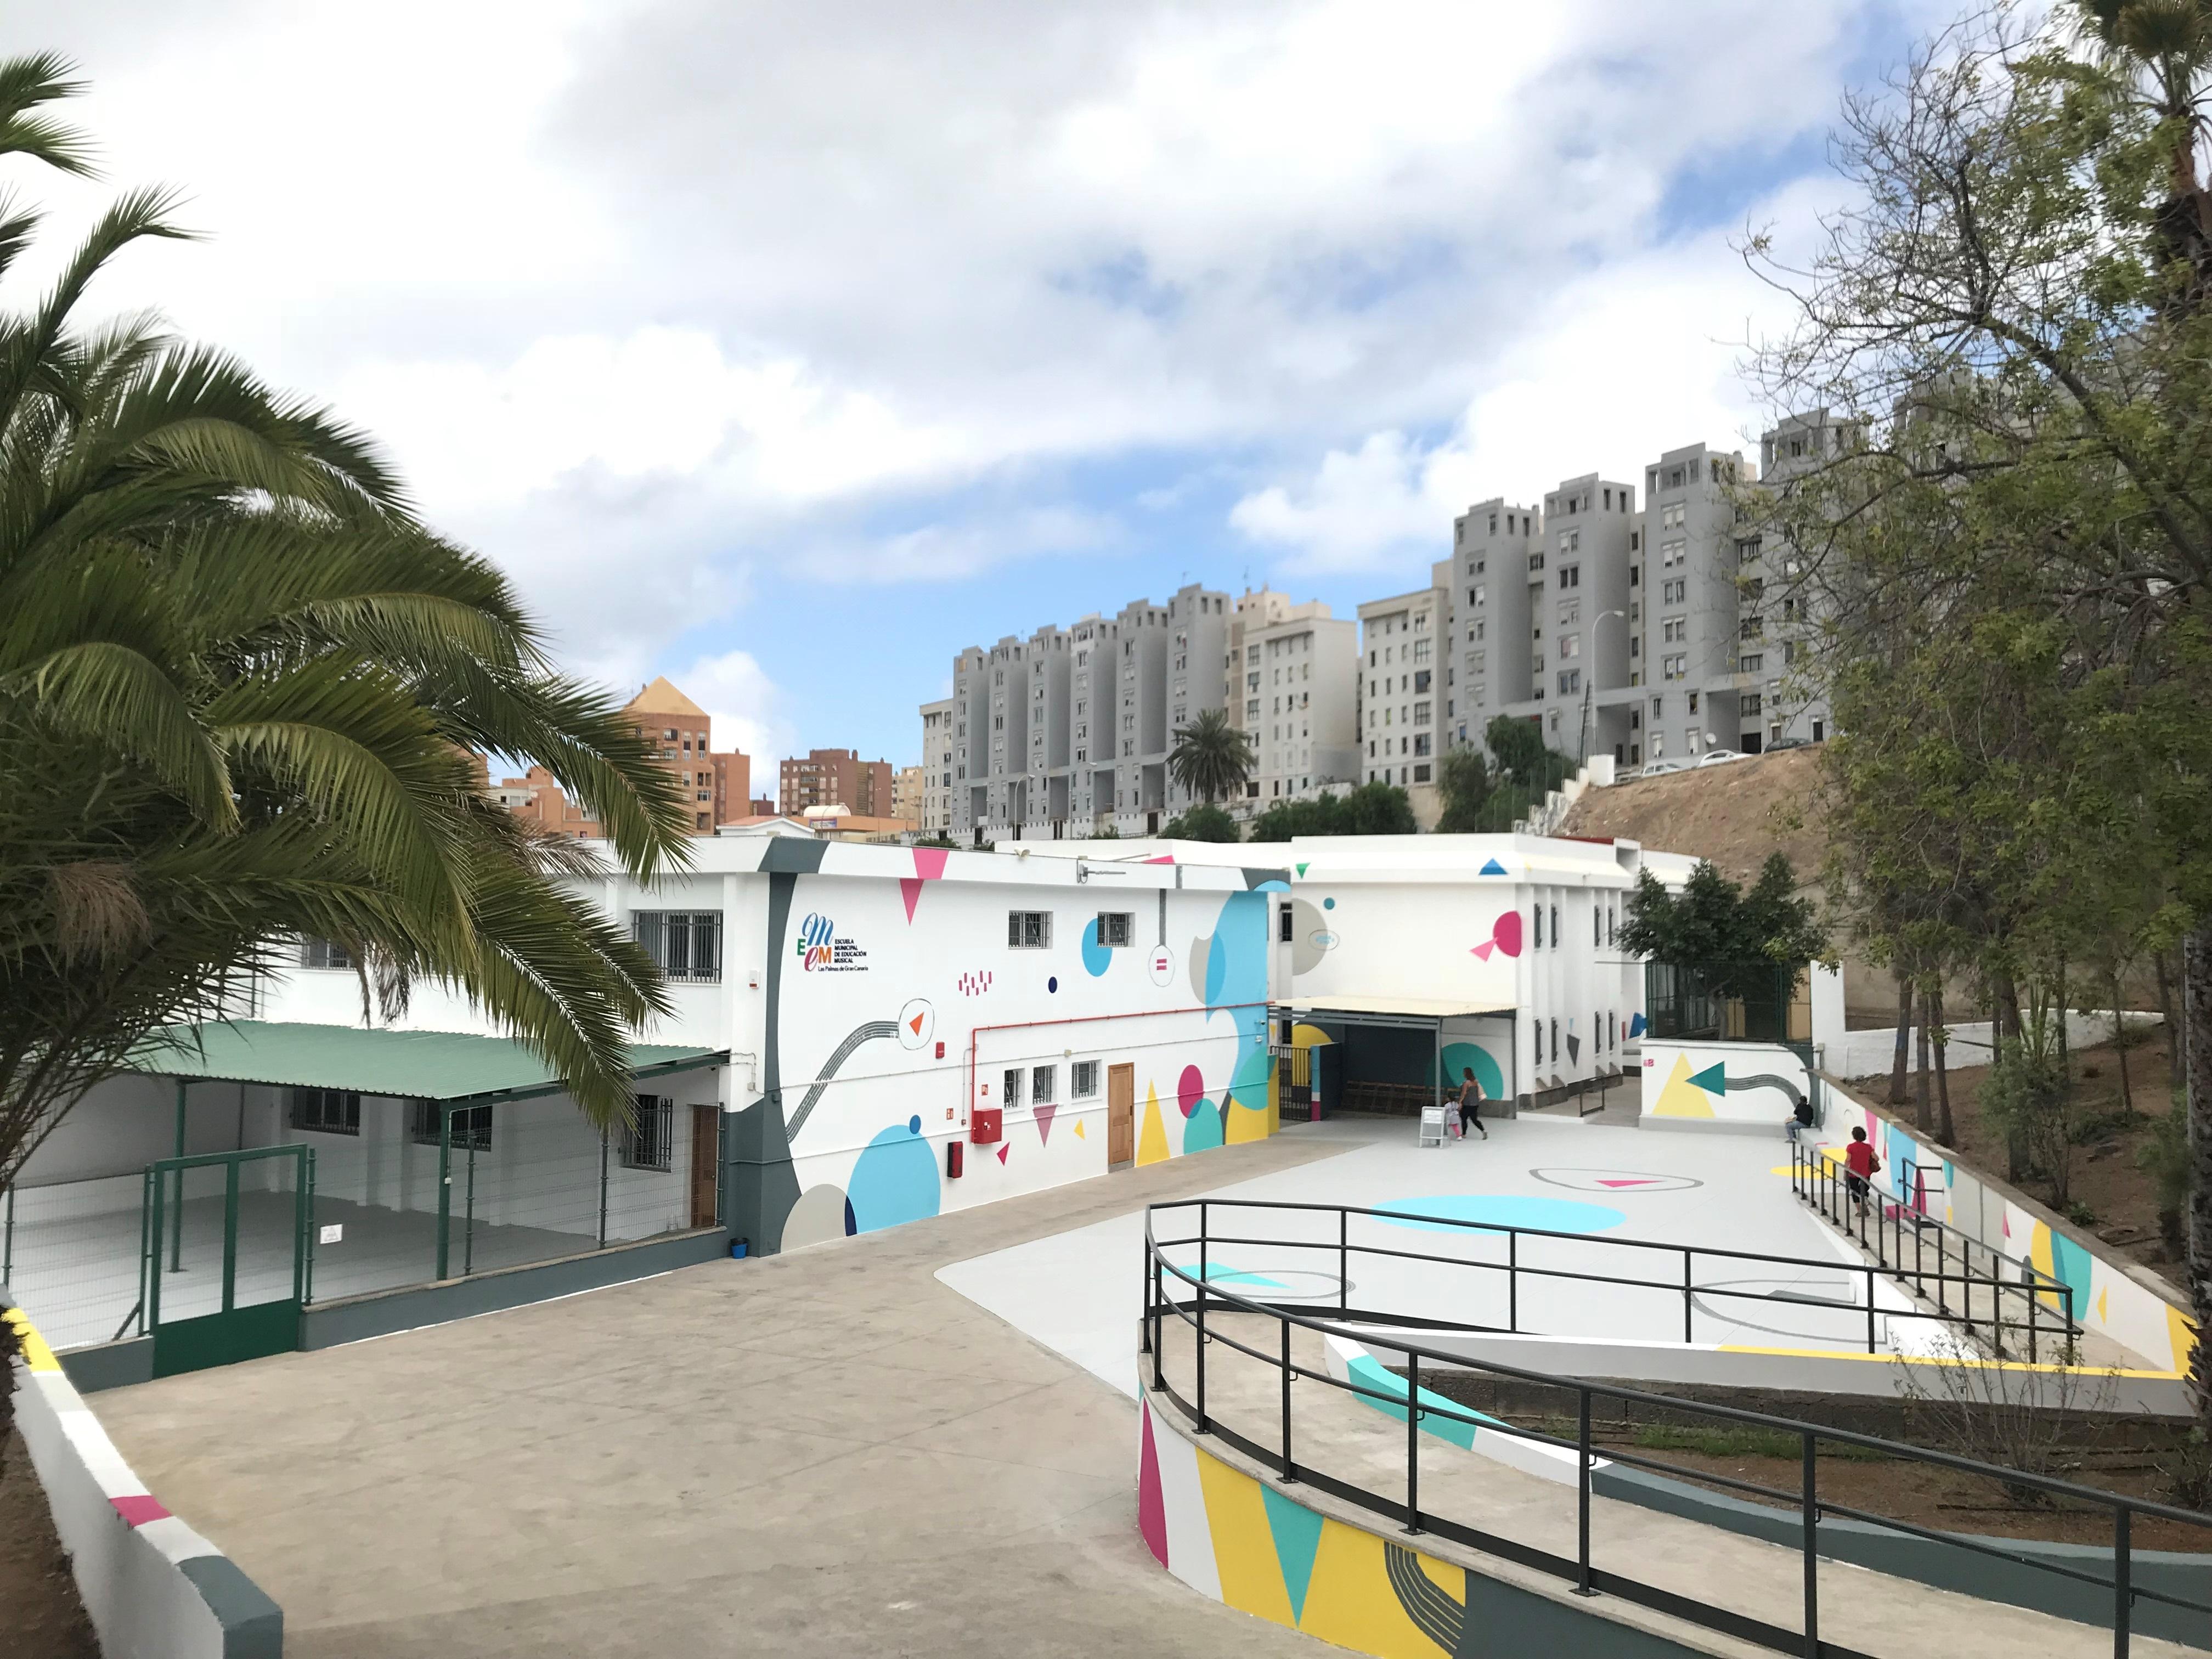 Escuela Municipal de Educación Musical de Las Palmas de Gran Canaria